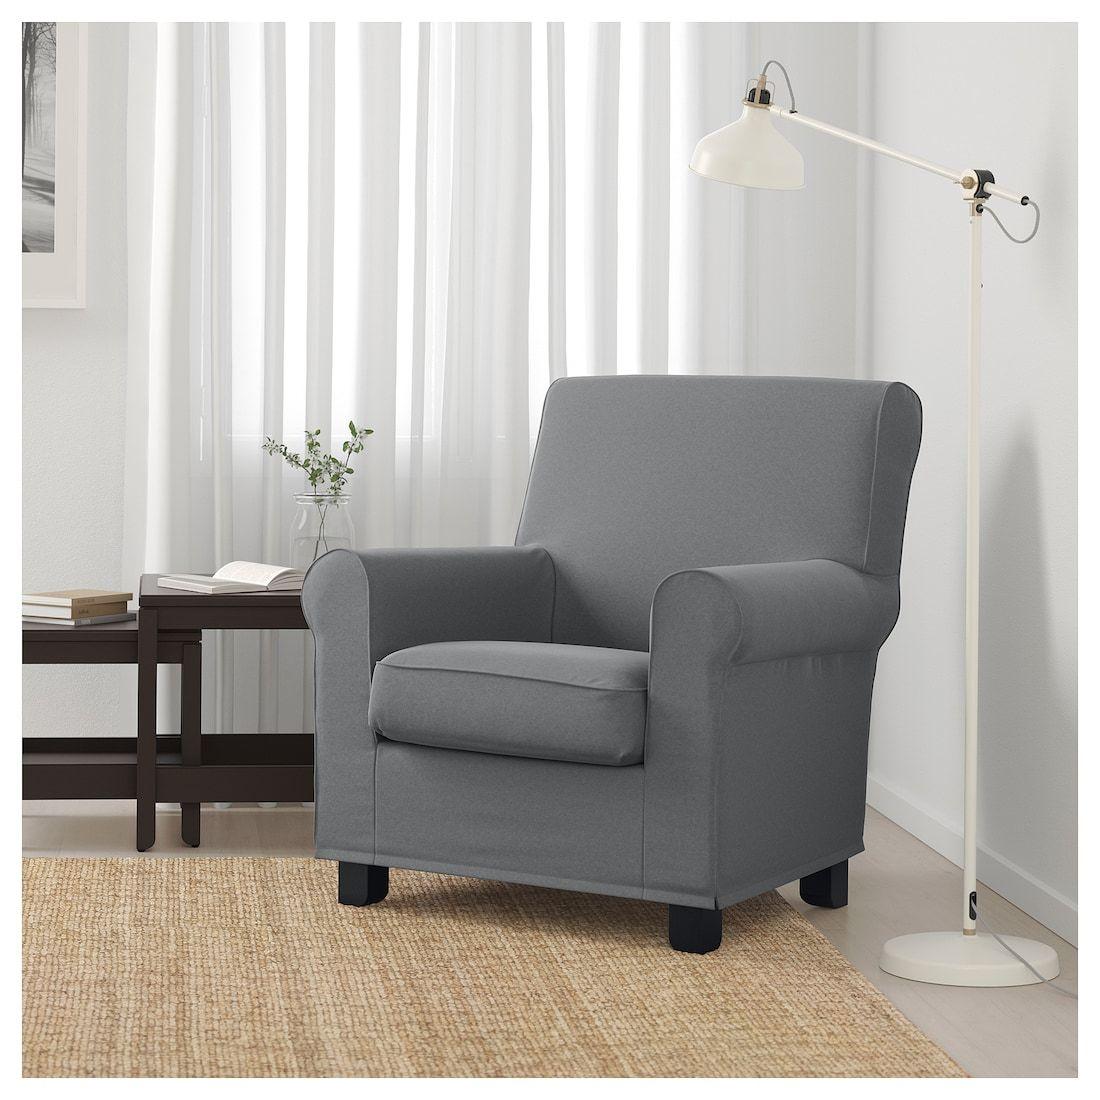 Gronlid Armchair Ljungen Medium Gray Armchair Ikea Armchair Ikea